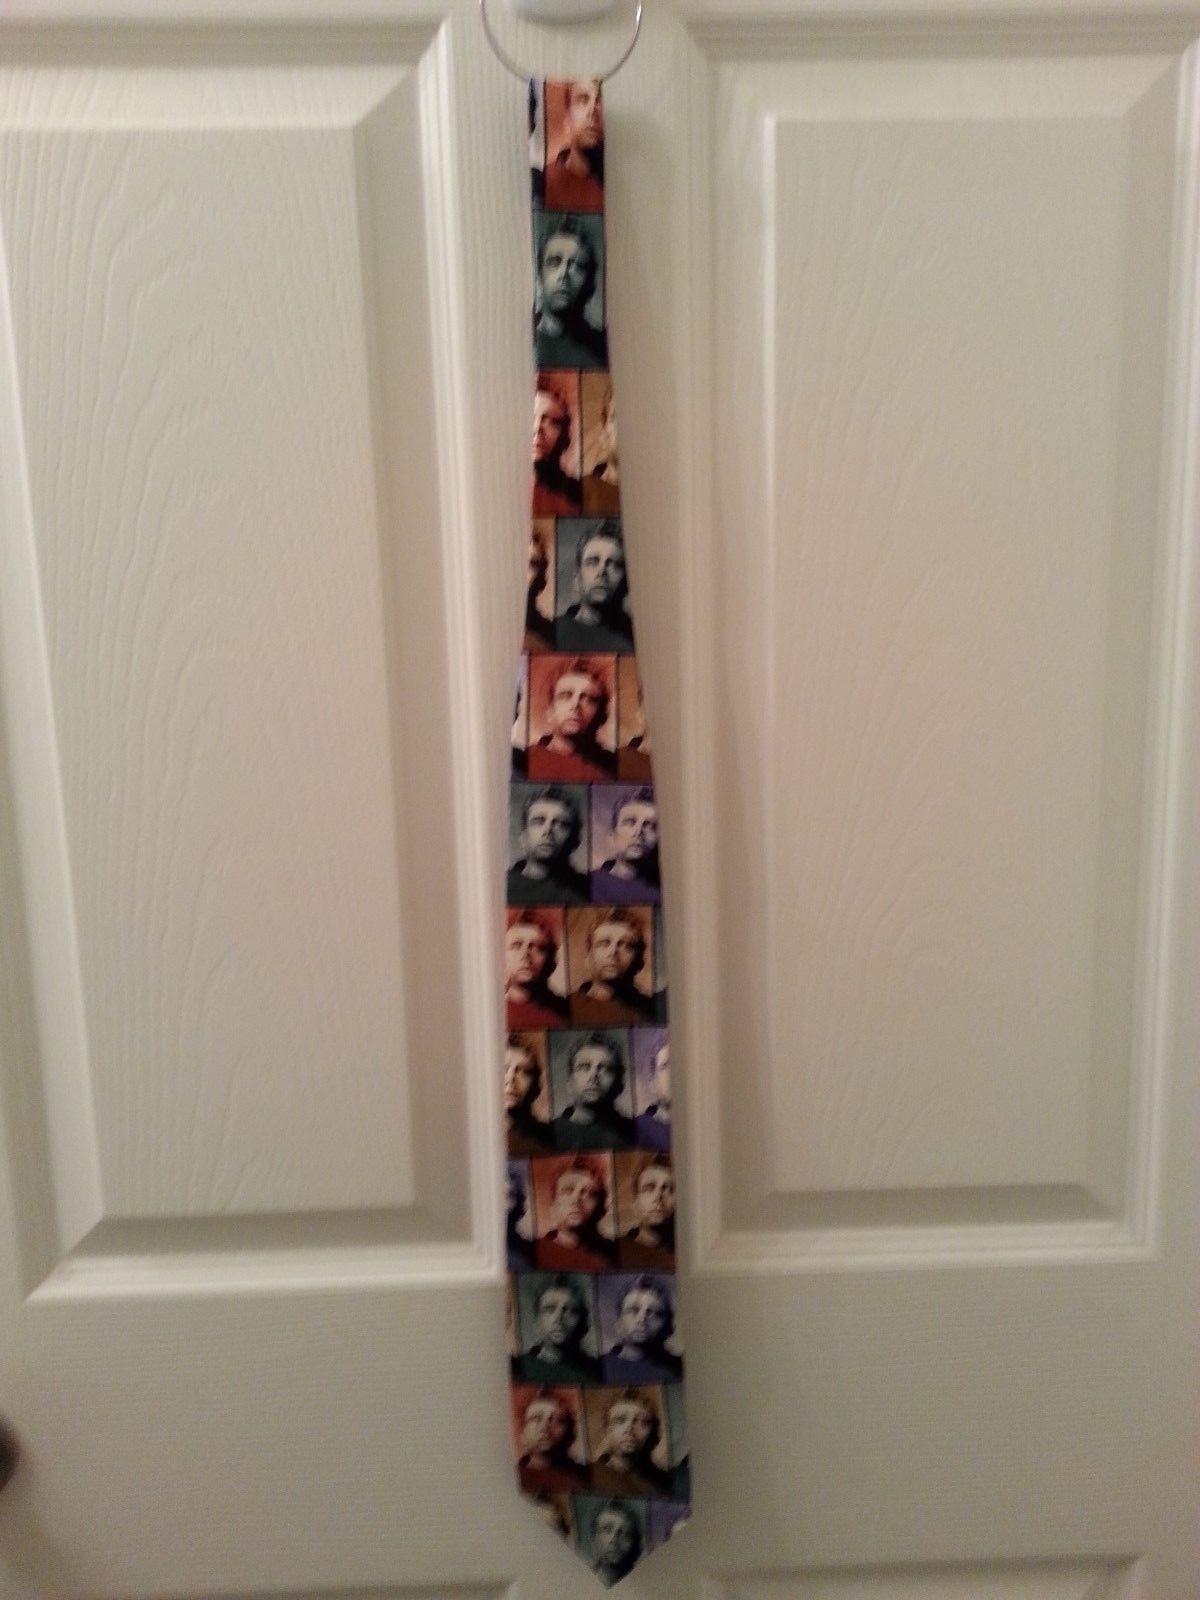 TRIO  JAMES DEAN - Shapes of James Dean / The Legend 2 Neck Ties, 1 Suspenders